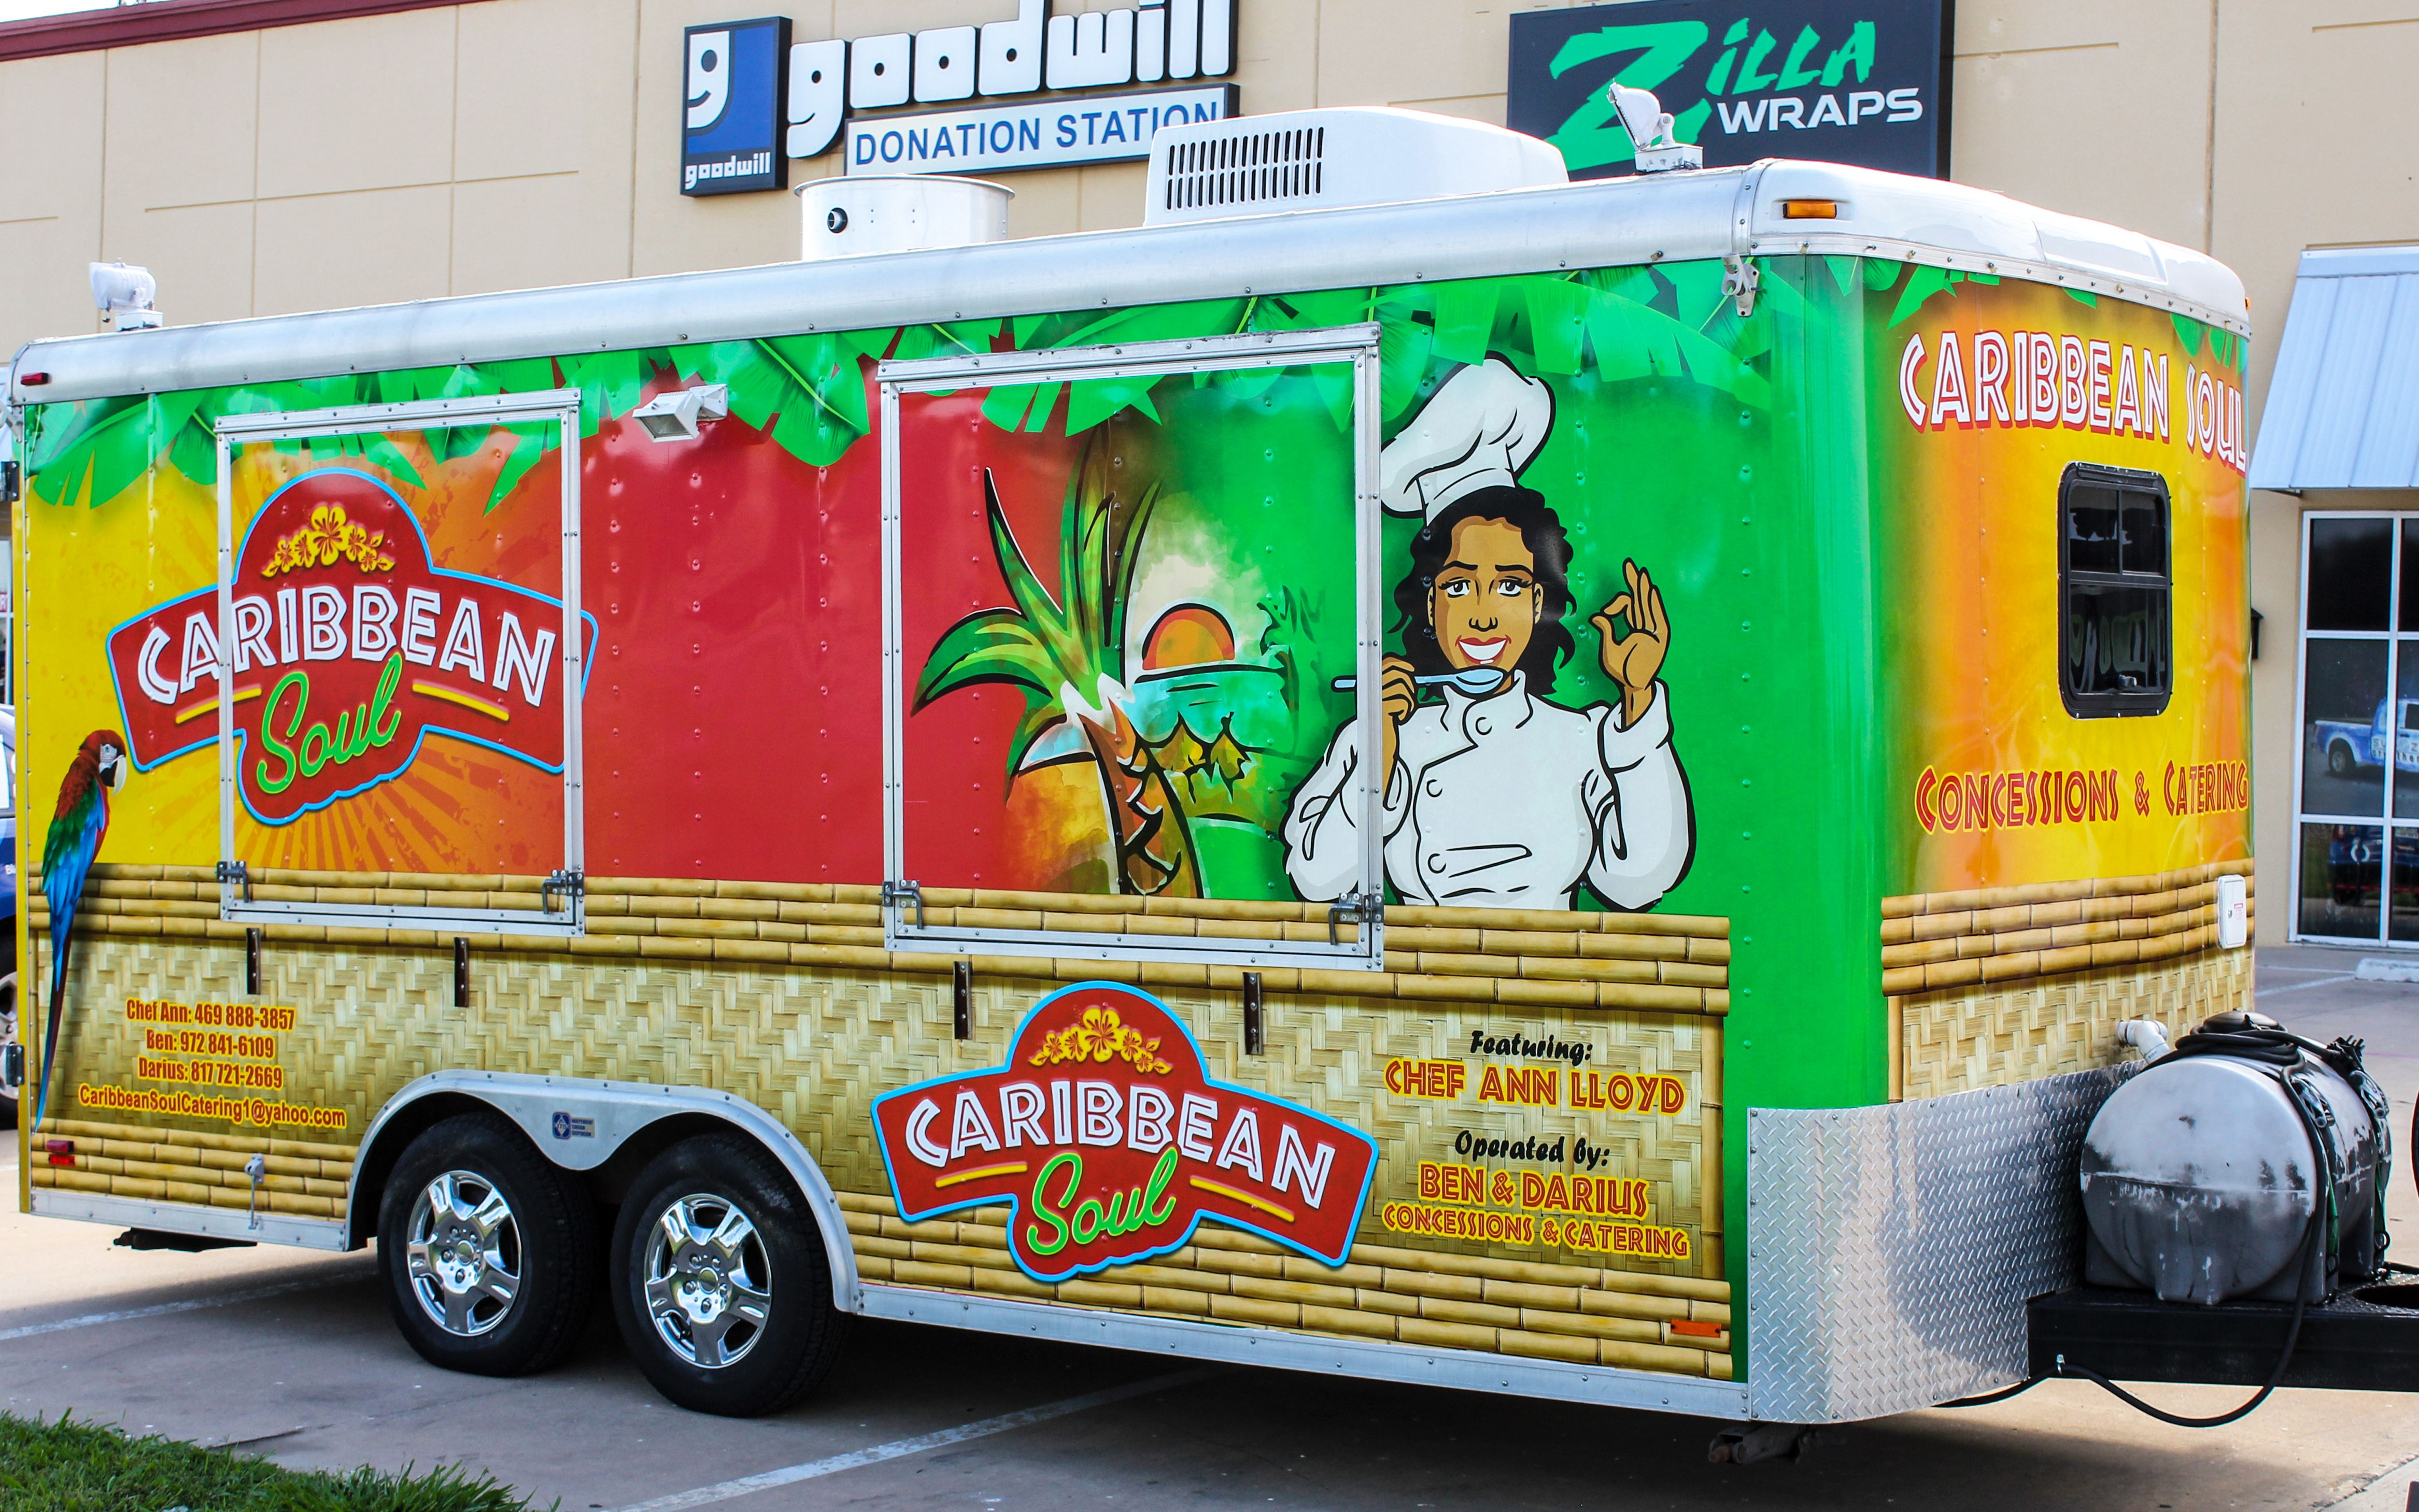 Caribbean food truck food truck design food truck food